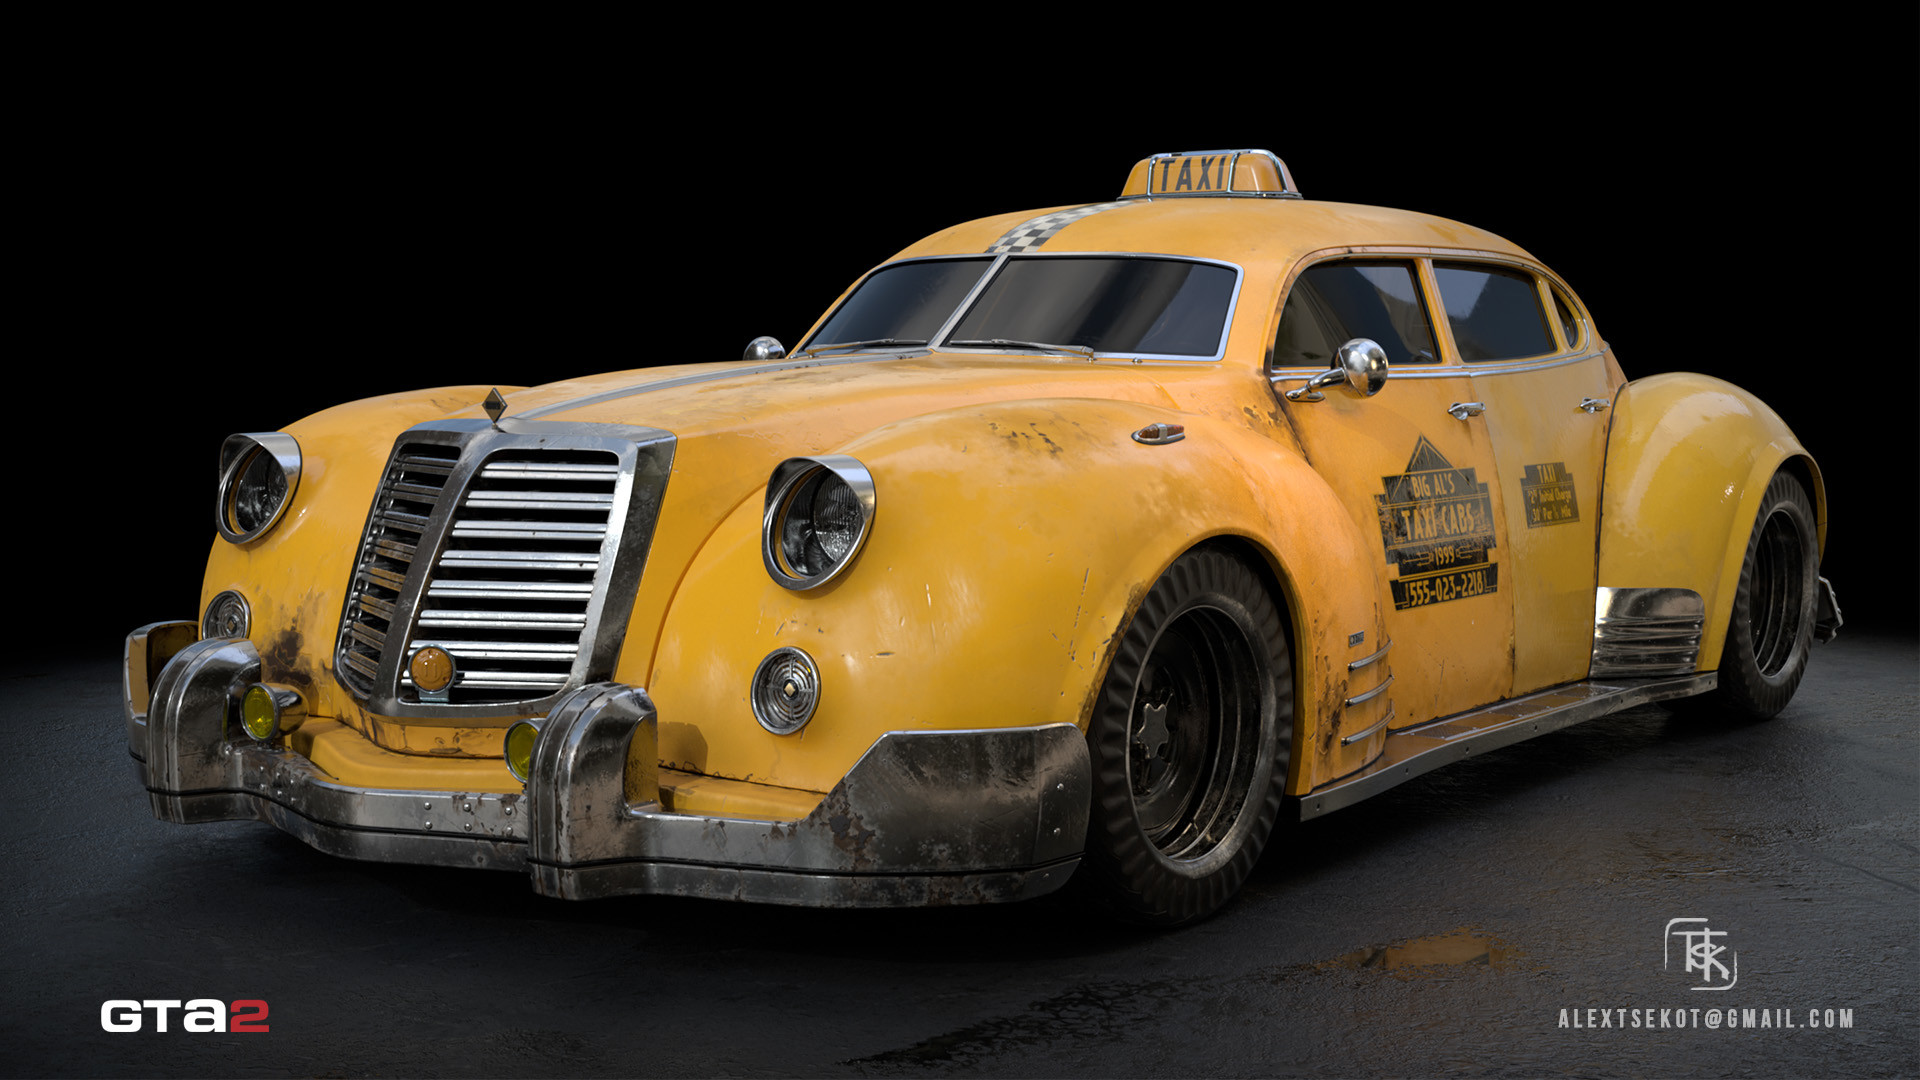 alex-tsekot-taxi-xpress-2.jpg?1546964070